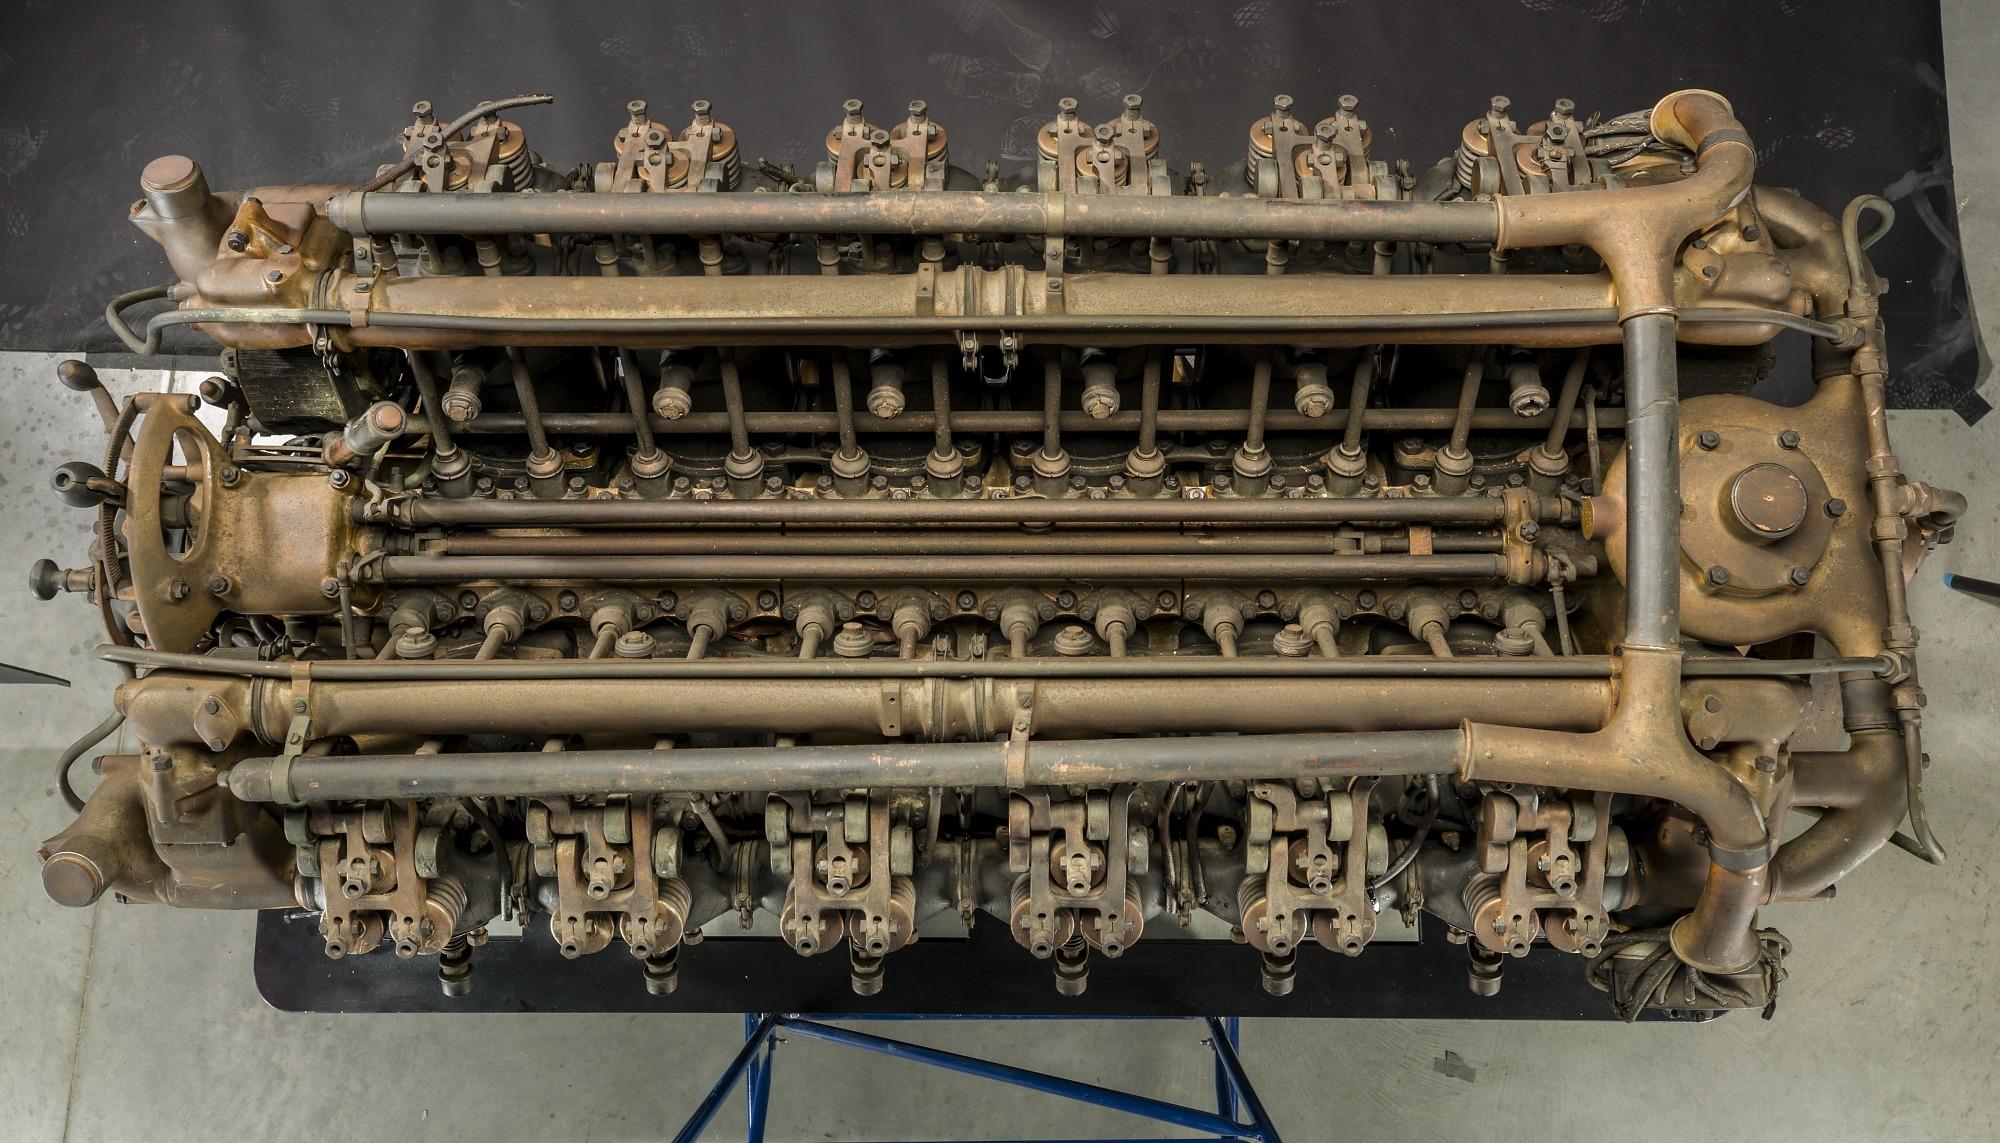 Maybach VL-2, V-12 Engine - Image version 8